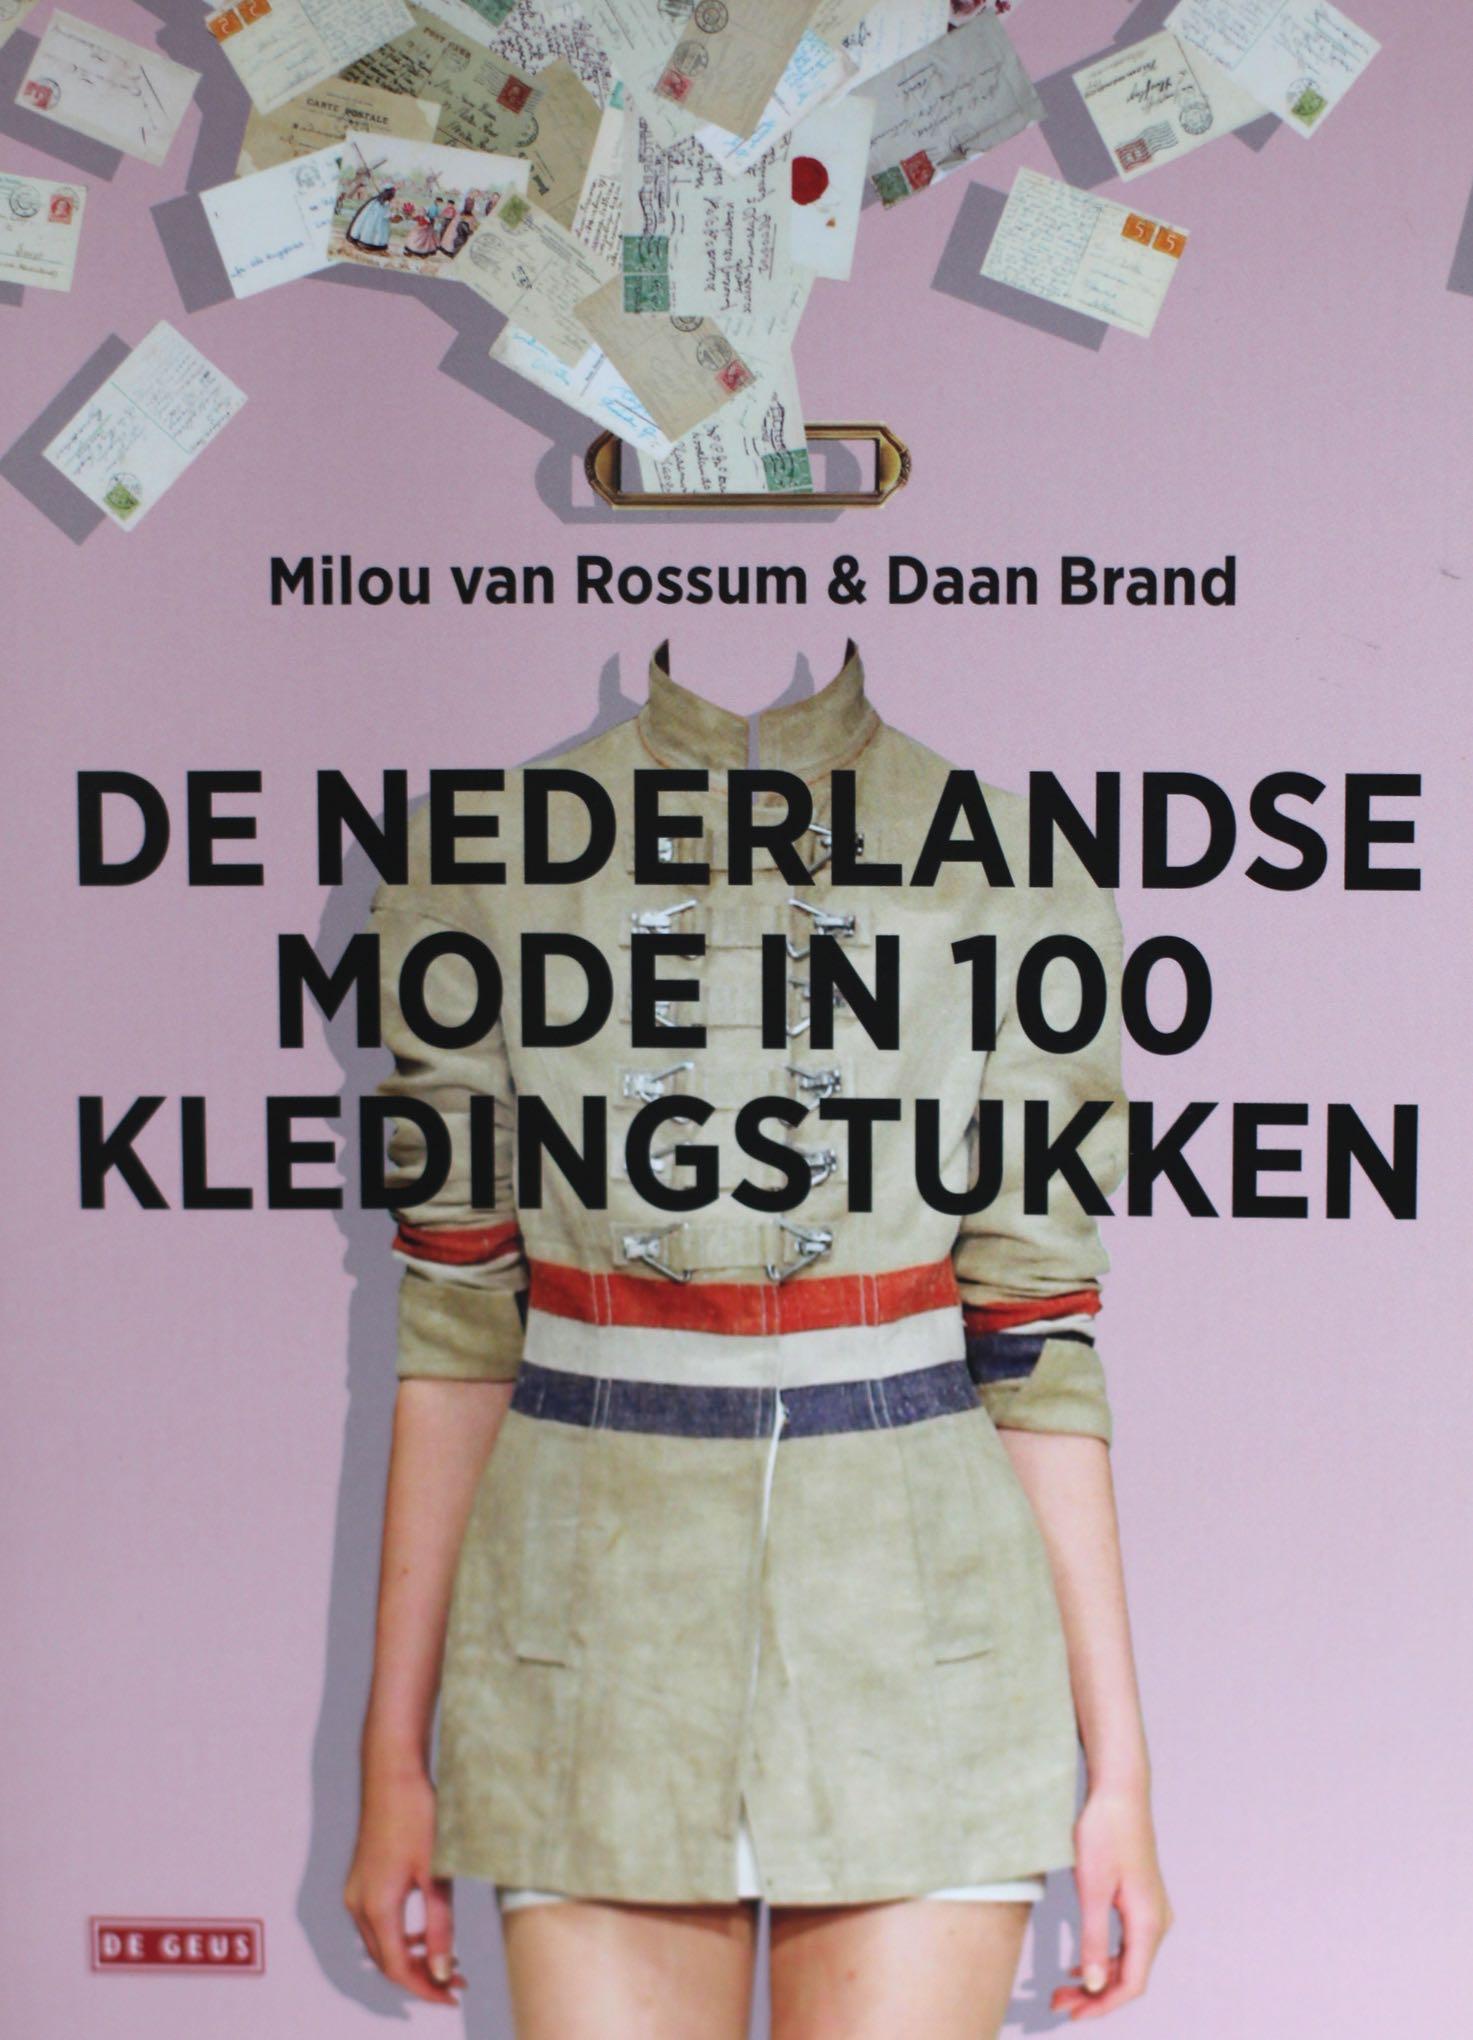 Boek: De Nederlandse mode in 100 kledingstukken